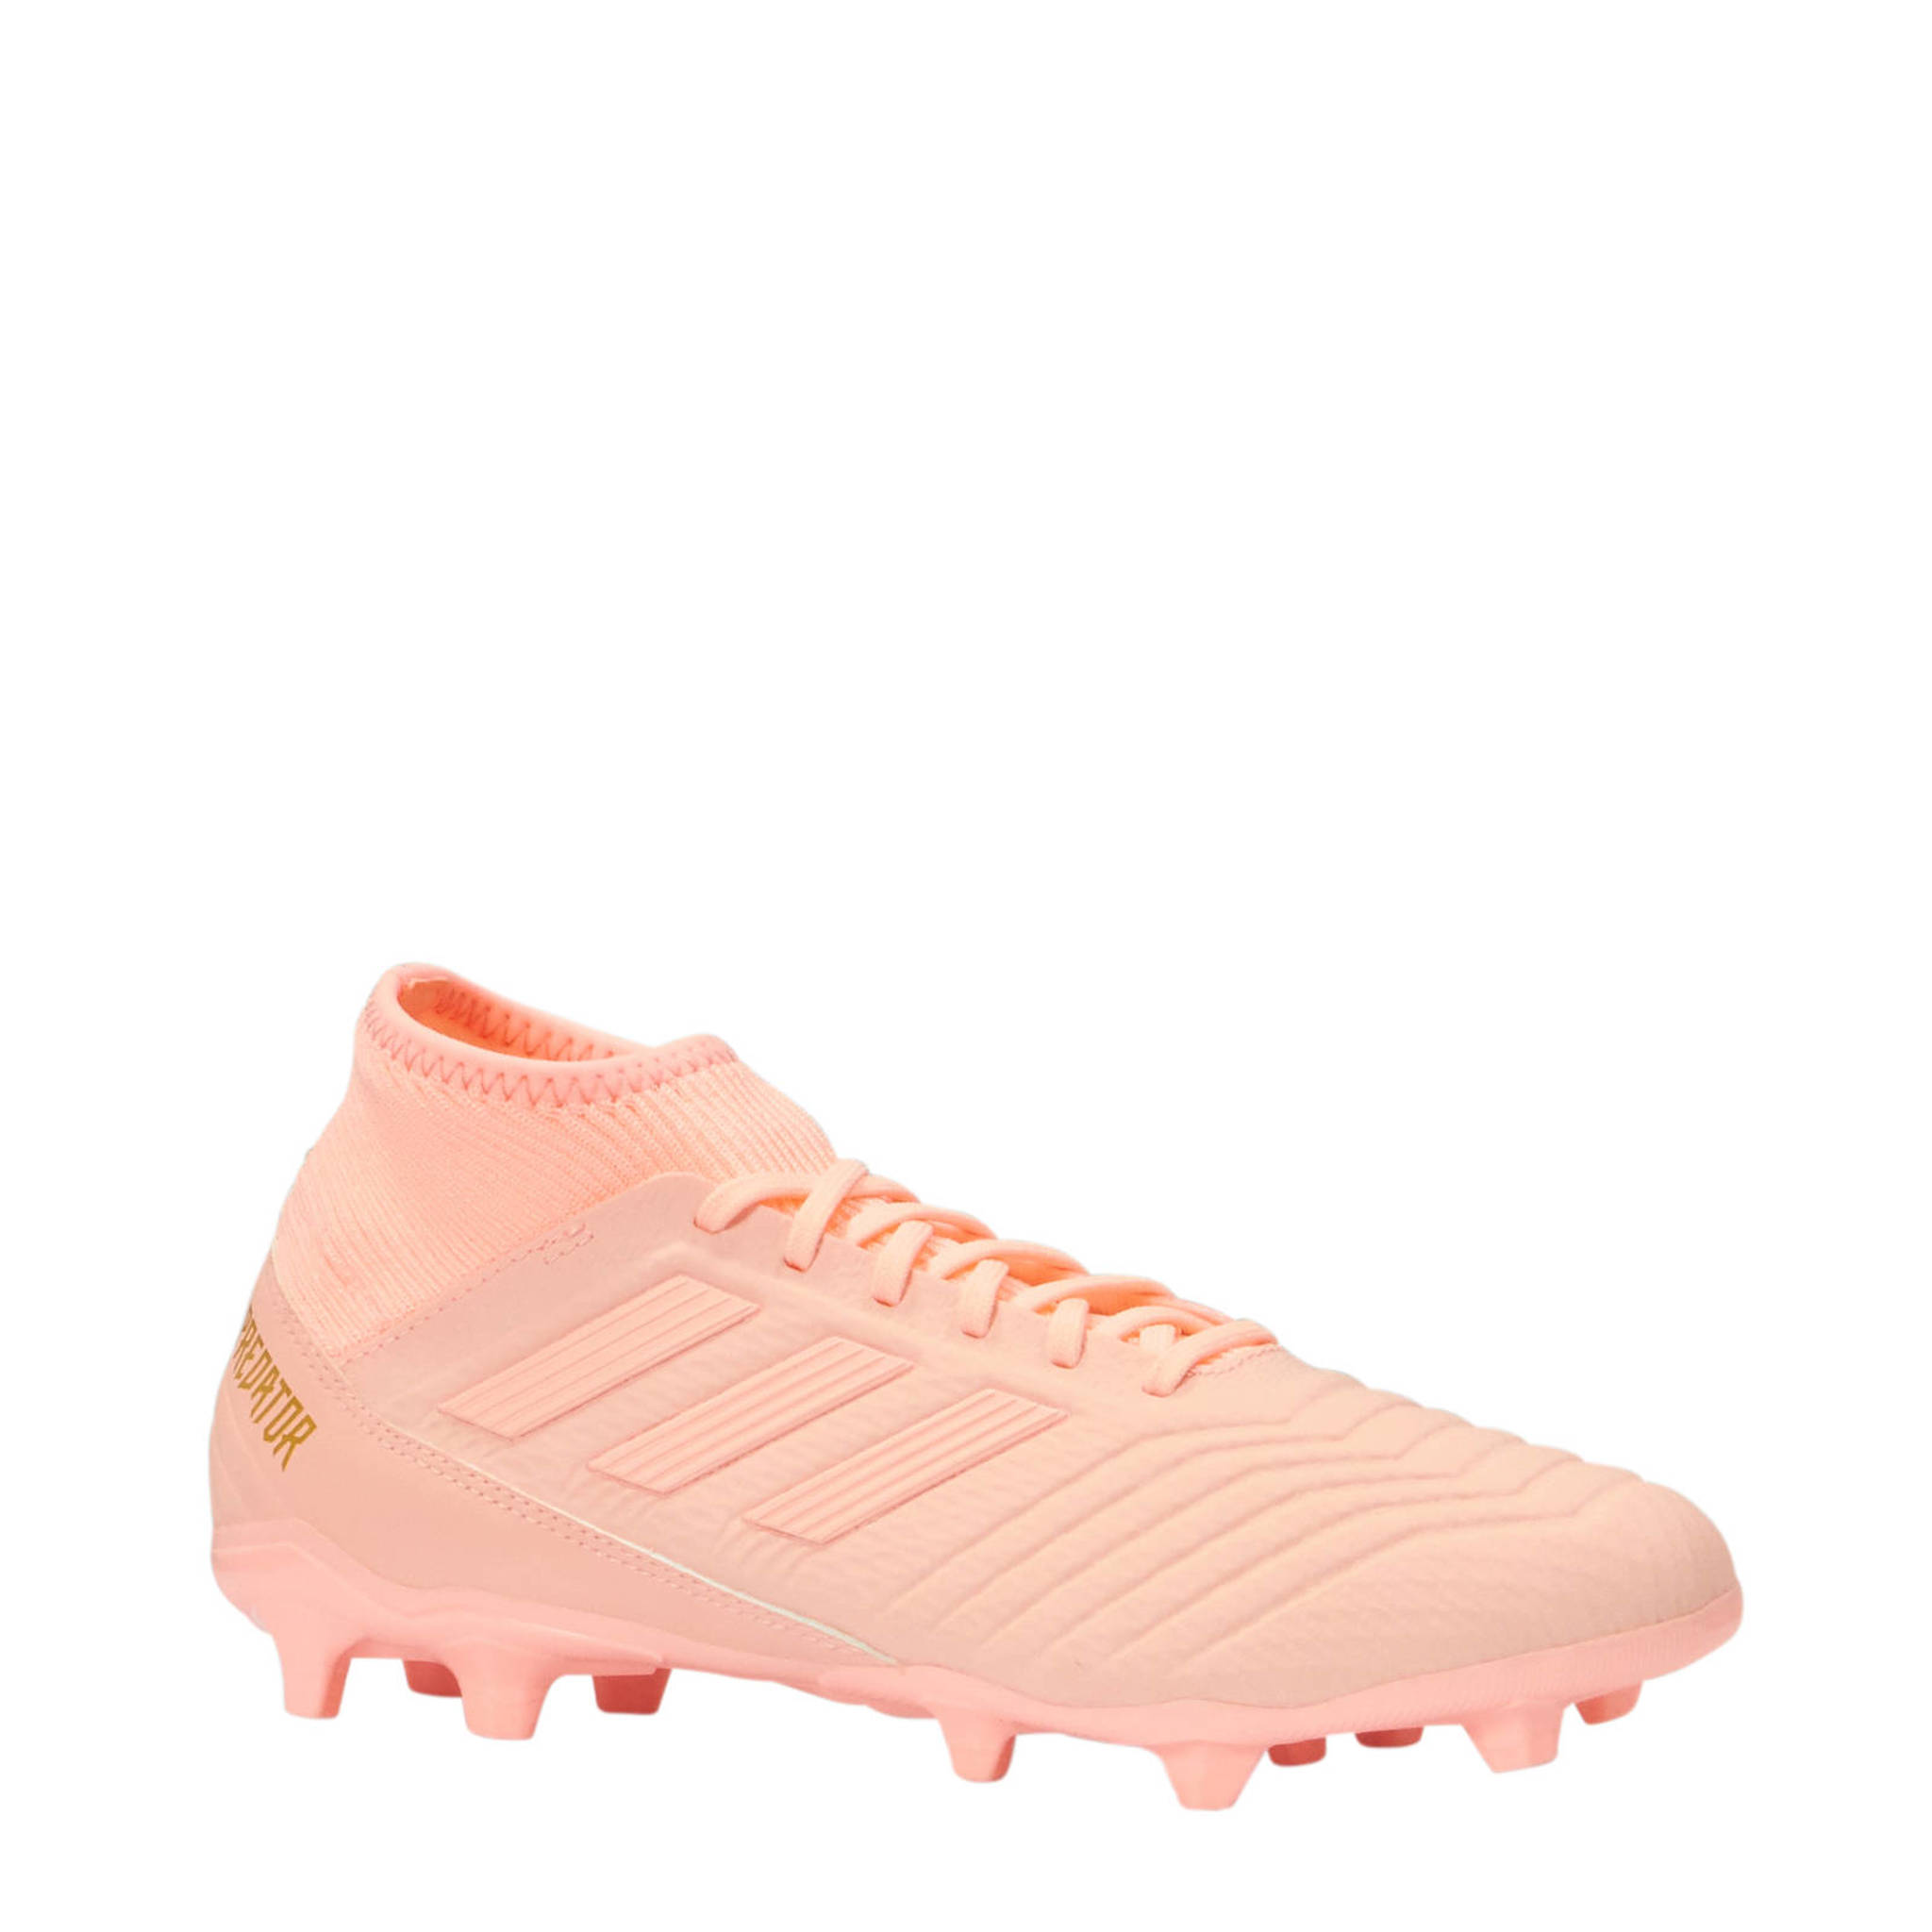 check out 29779 59104 adidas performance Predator 18.3 FG voetbalschoenen roze  we